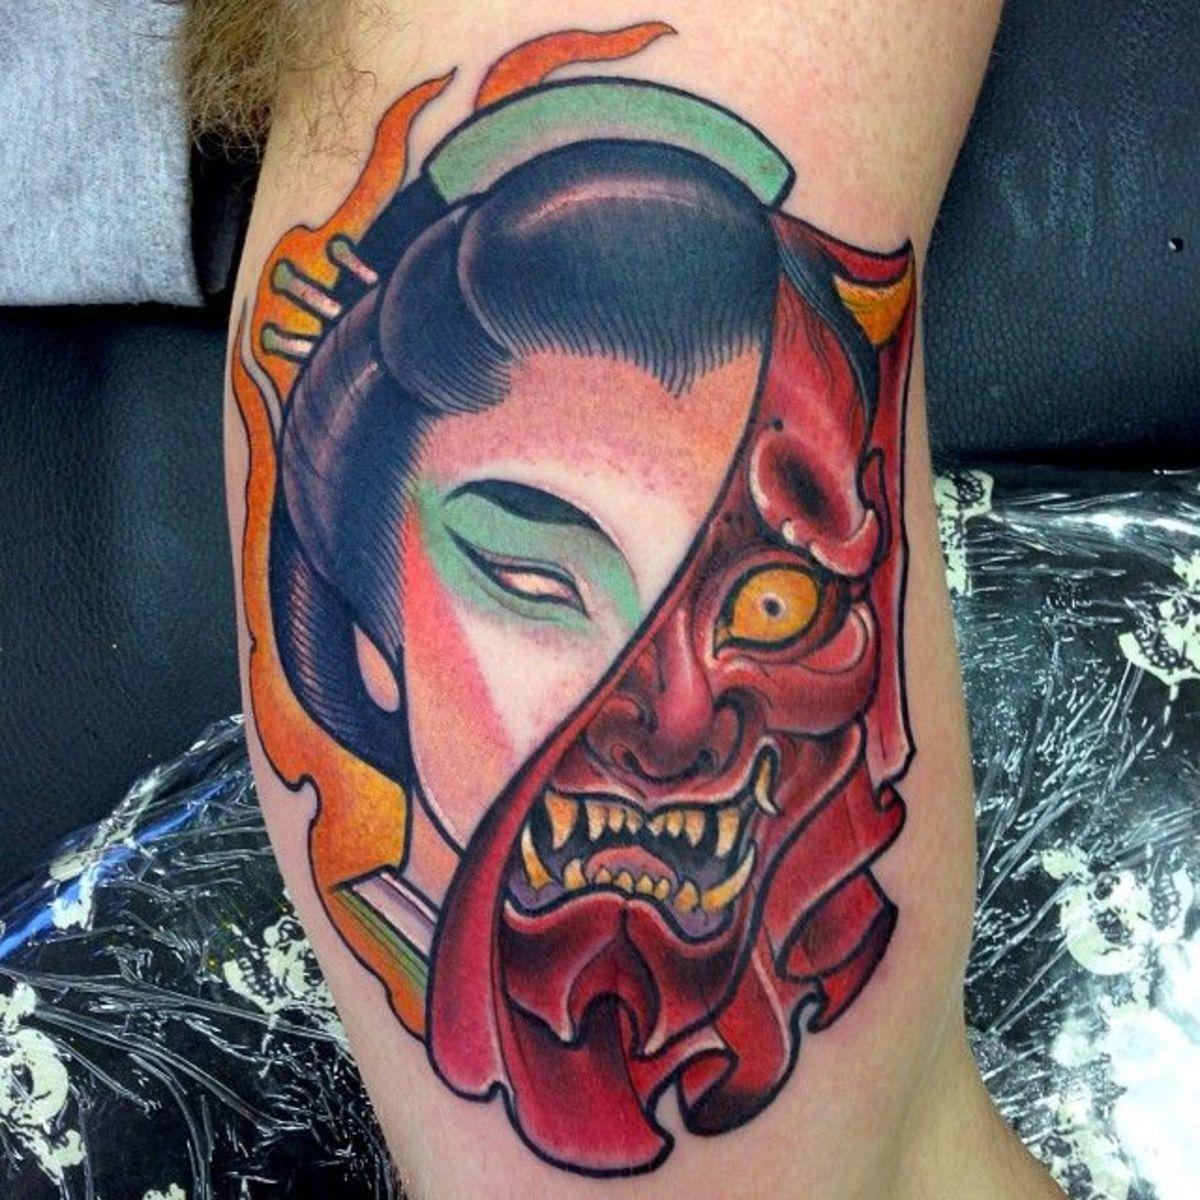 Japanese Hannya Tattoos Origins Meanings Ideas Tatring Tattoos Piercings